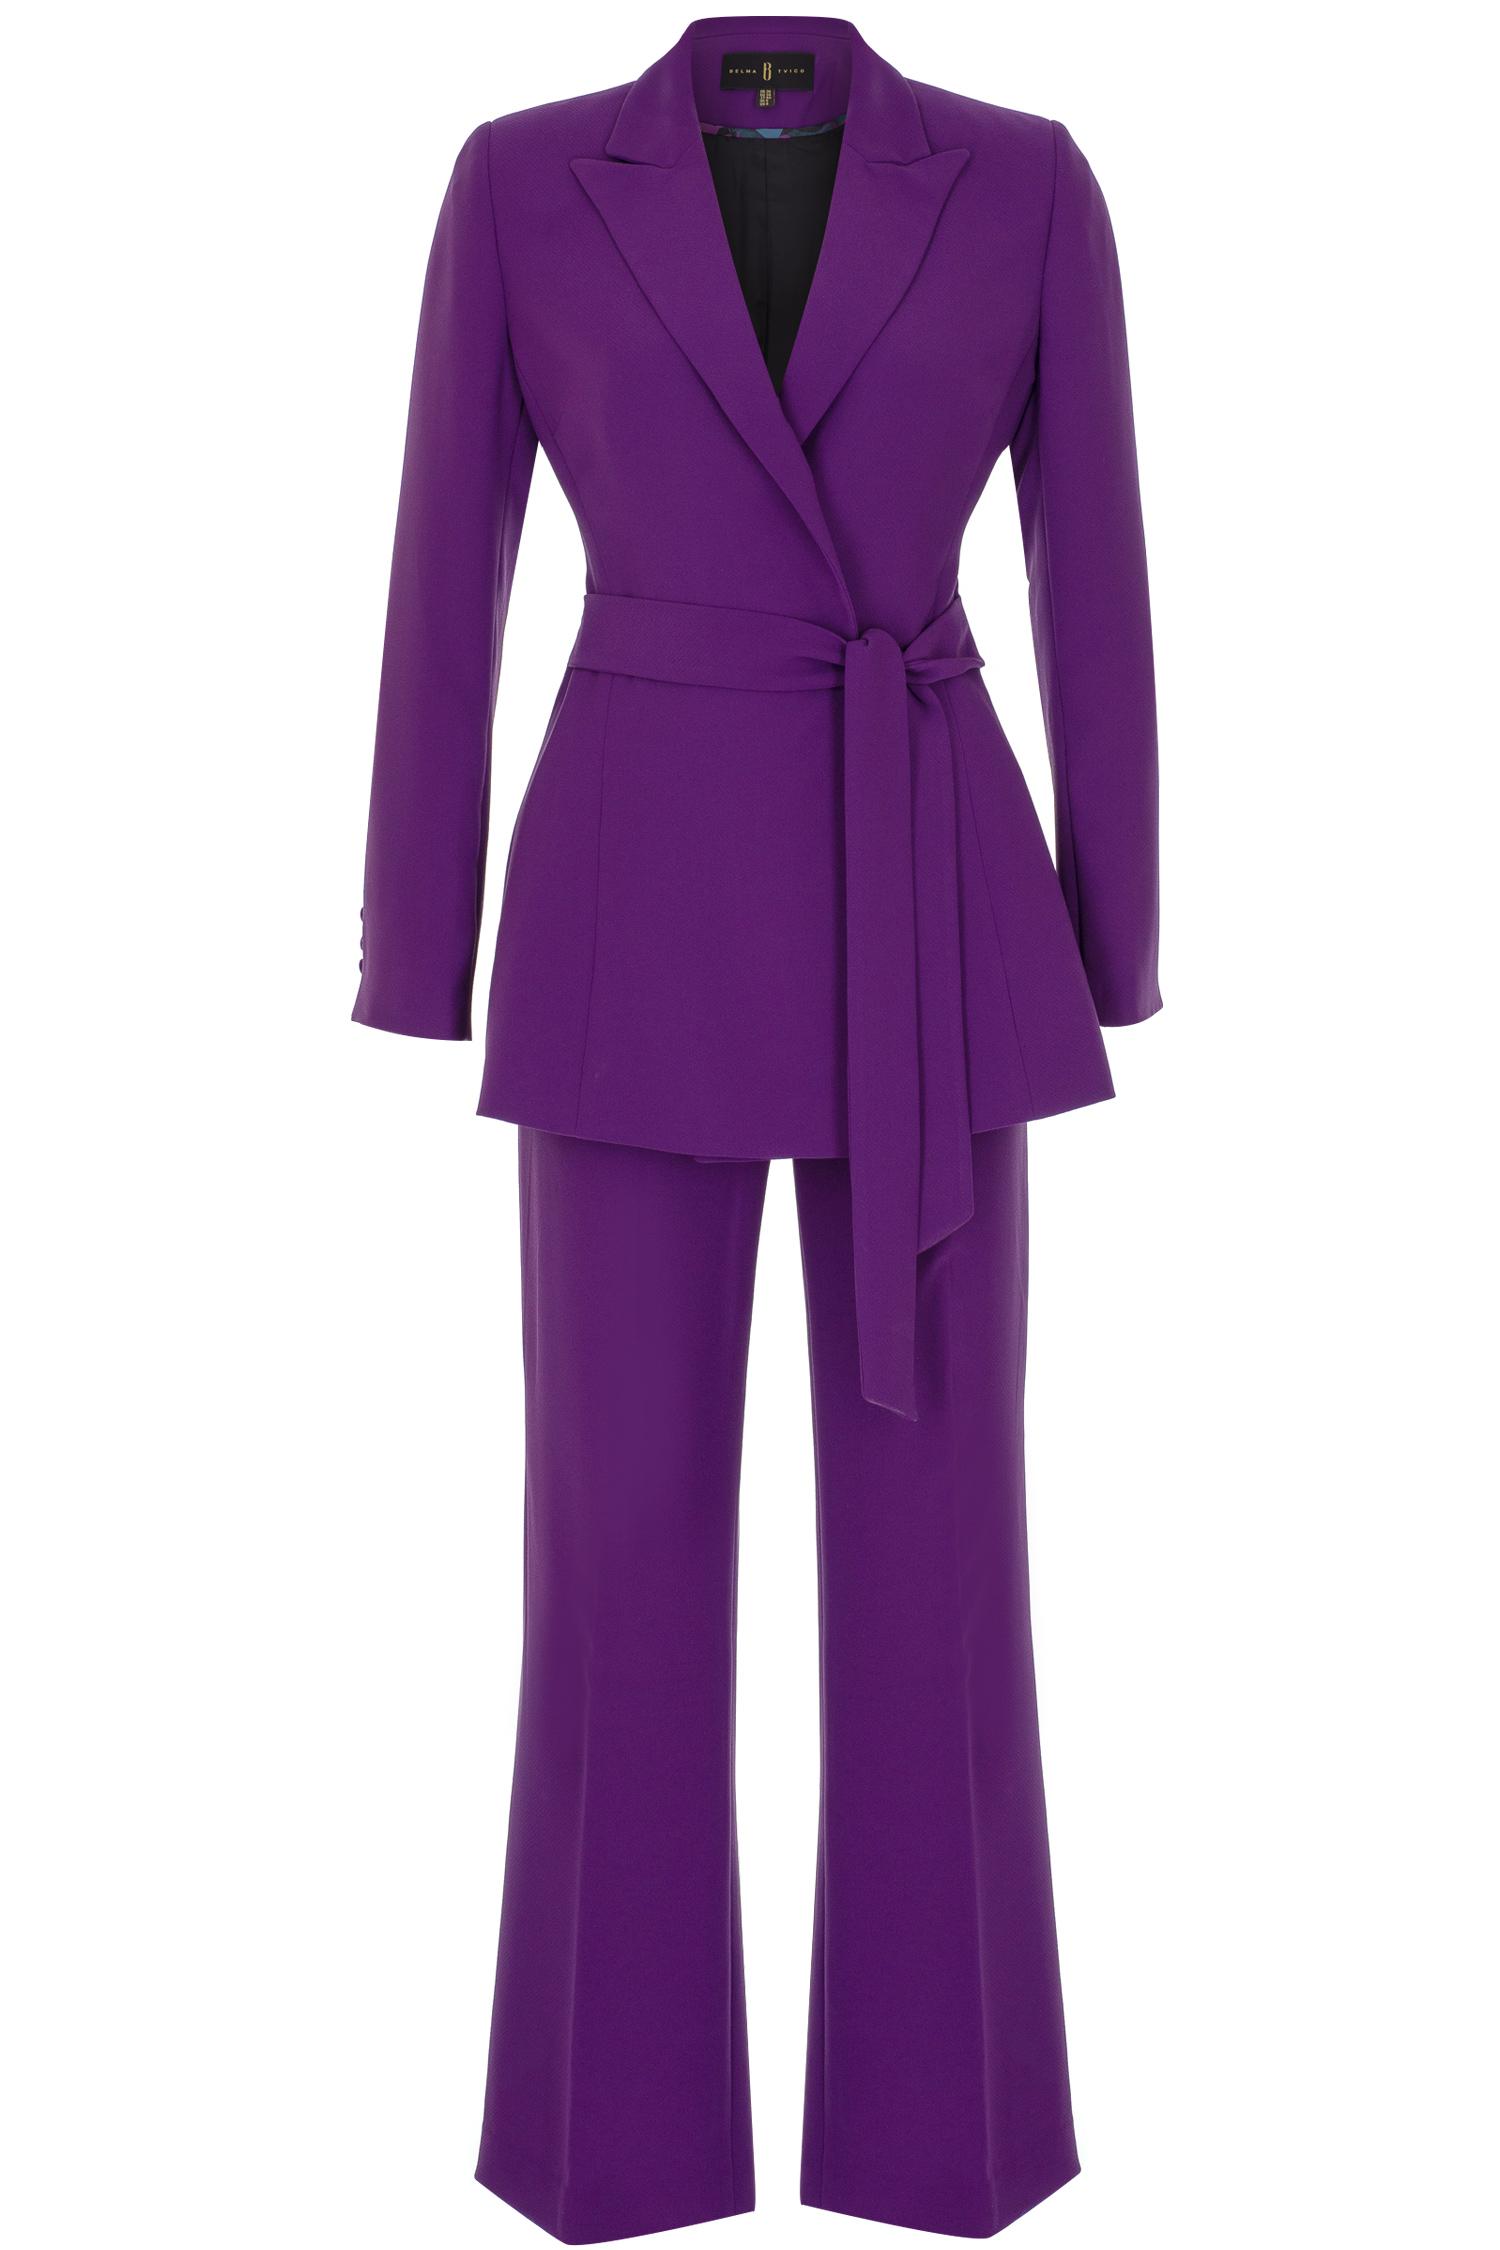 violet suit, violet, designer suit